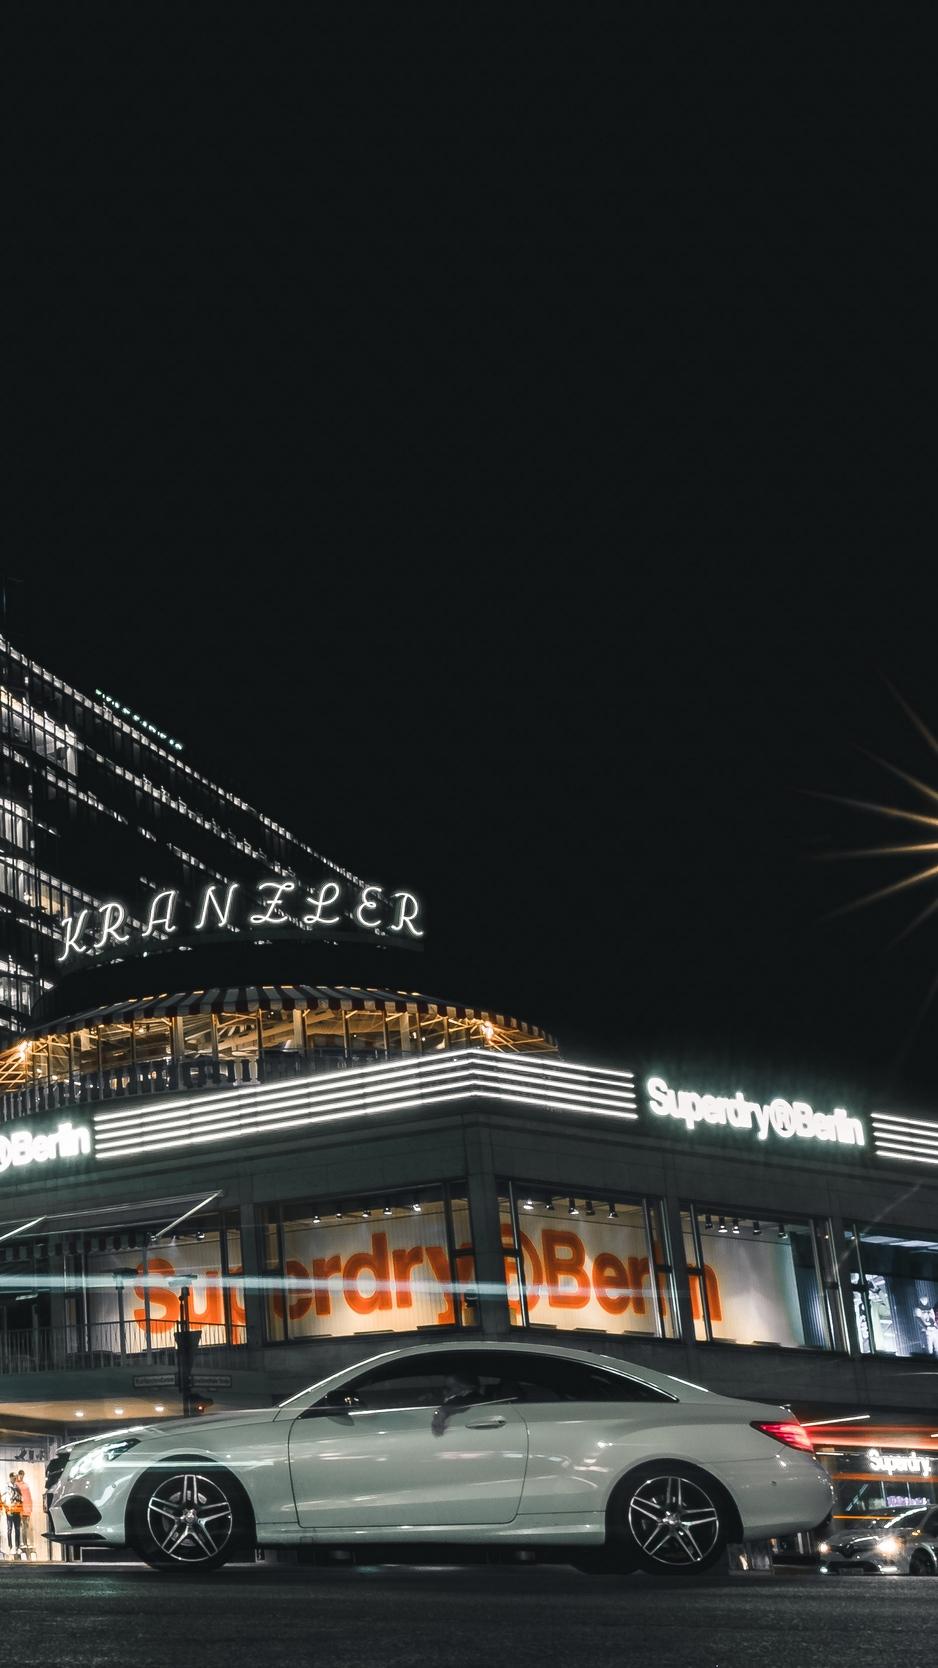 Download wallpaper 938x1668 car night city street city lights 938x1668